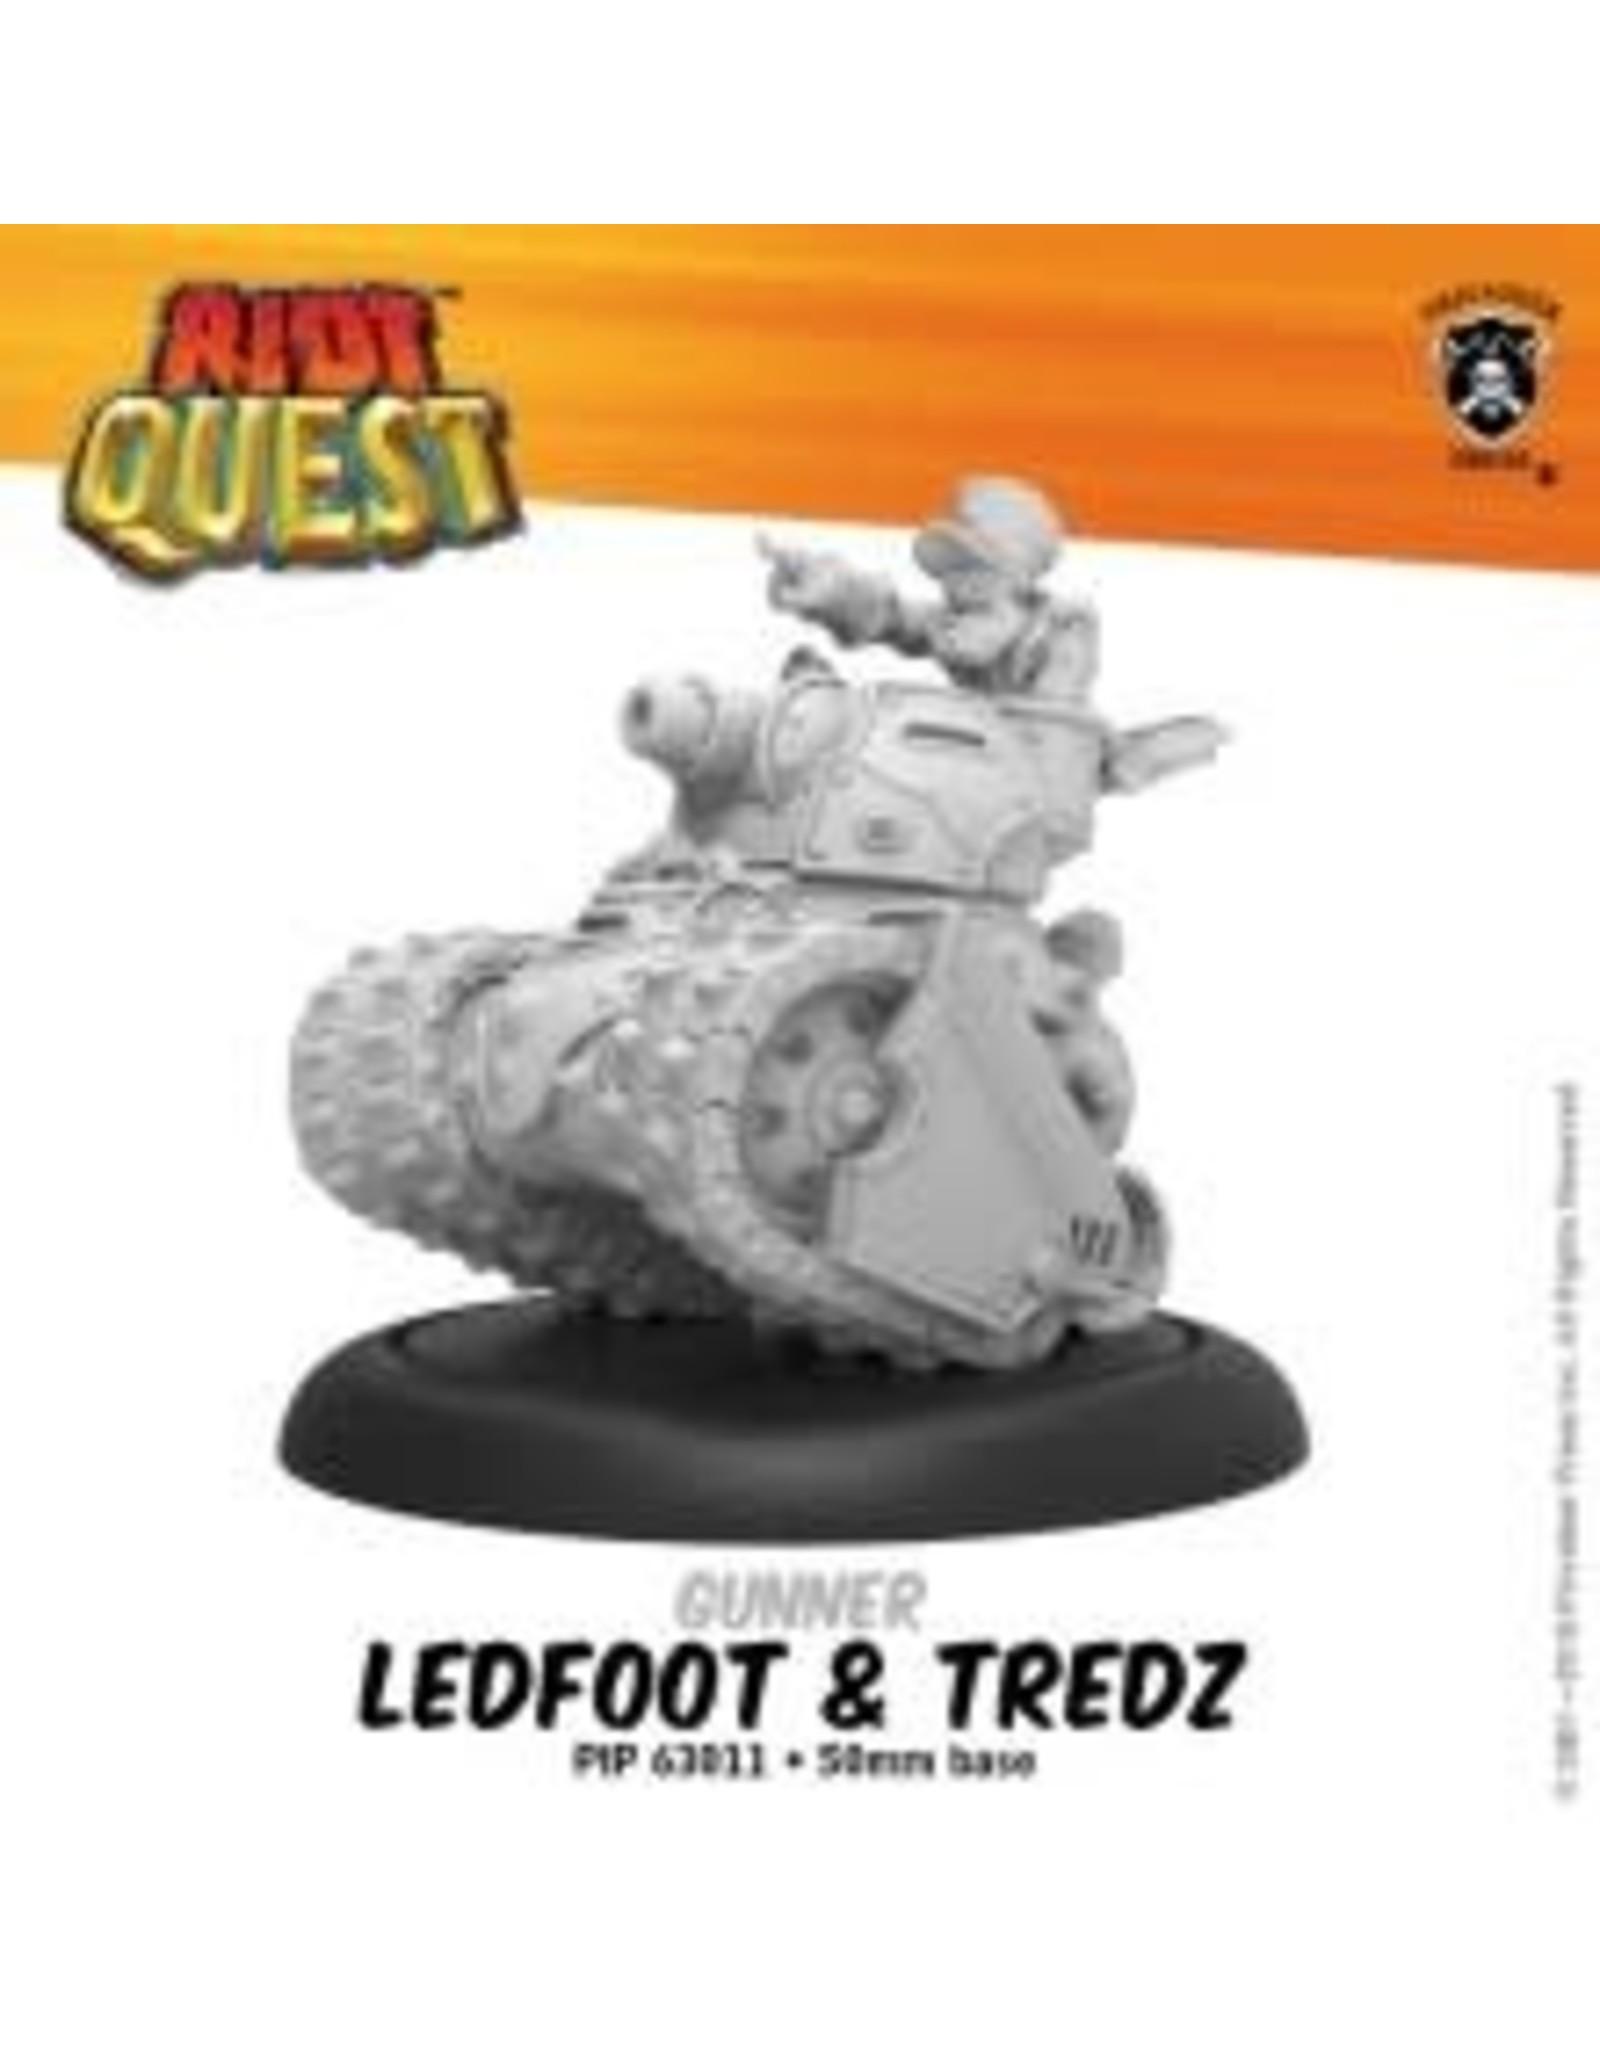 Privateer Press Ledfoot & Tredz – Riot Quest Gunner (metal/resin)